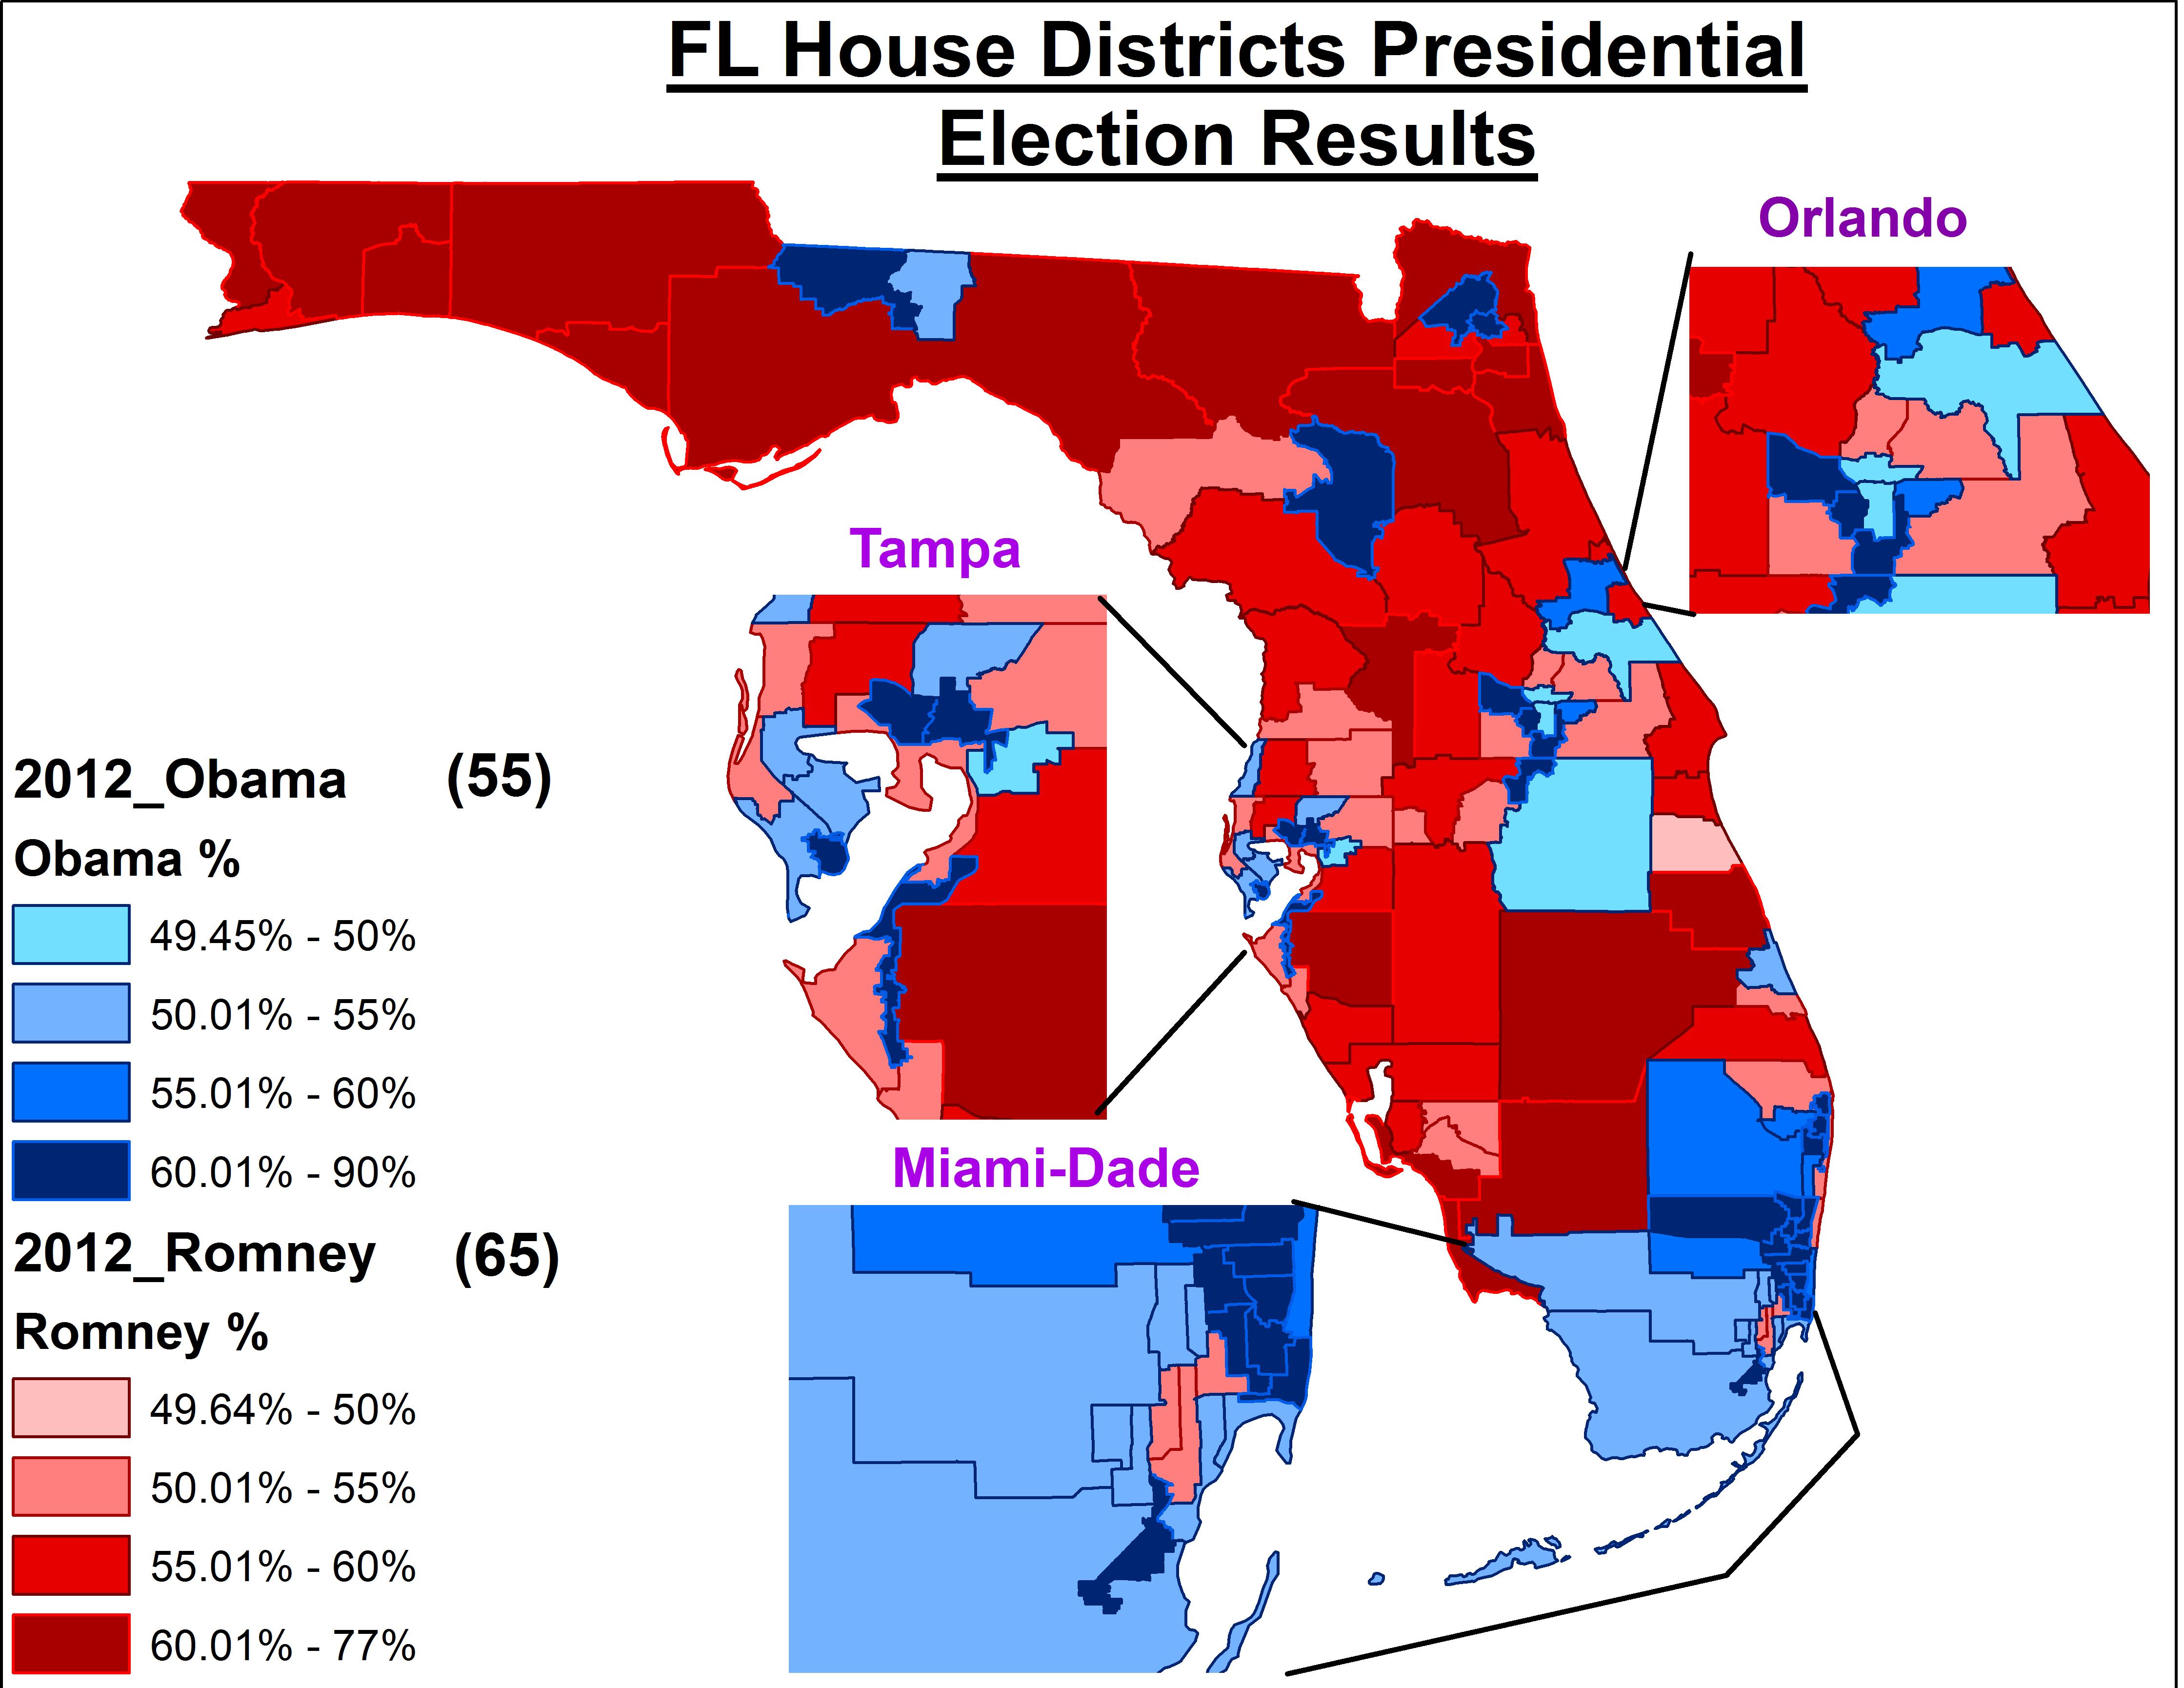 Republican Democratic State Map.Rethinking Rural Campaign Strategies For Progressives The Florida